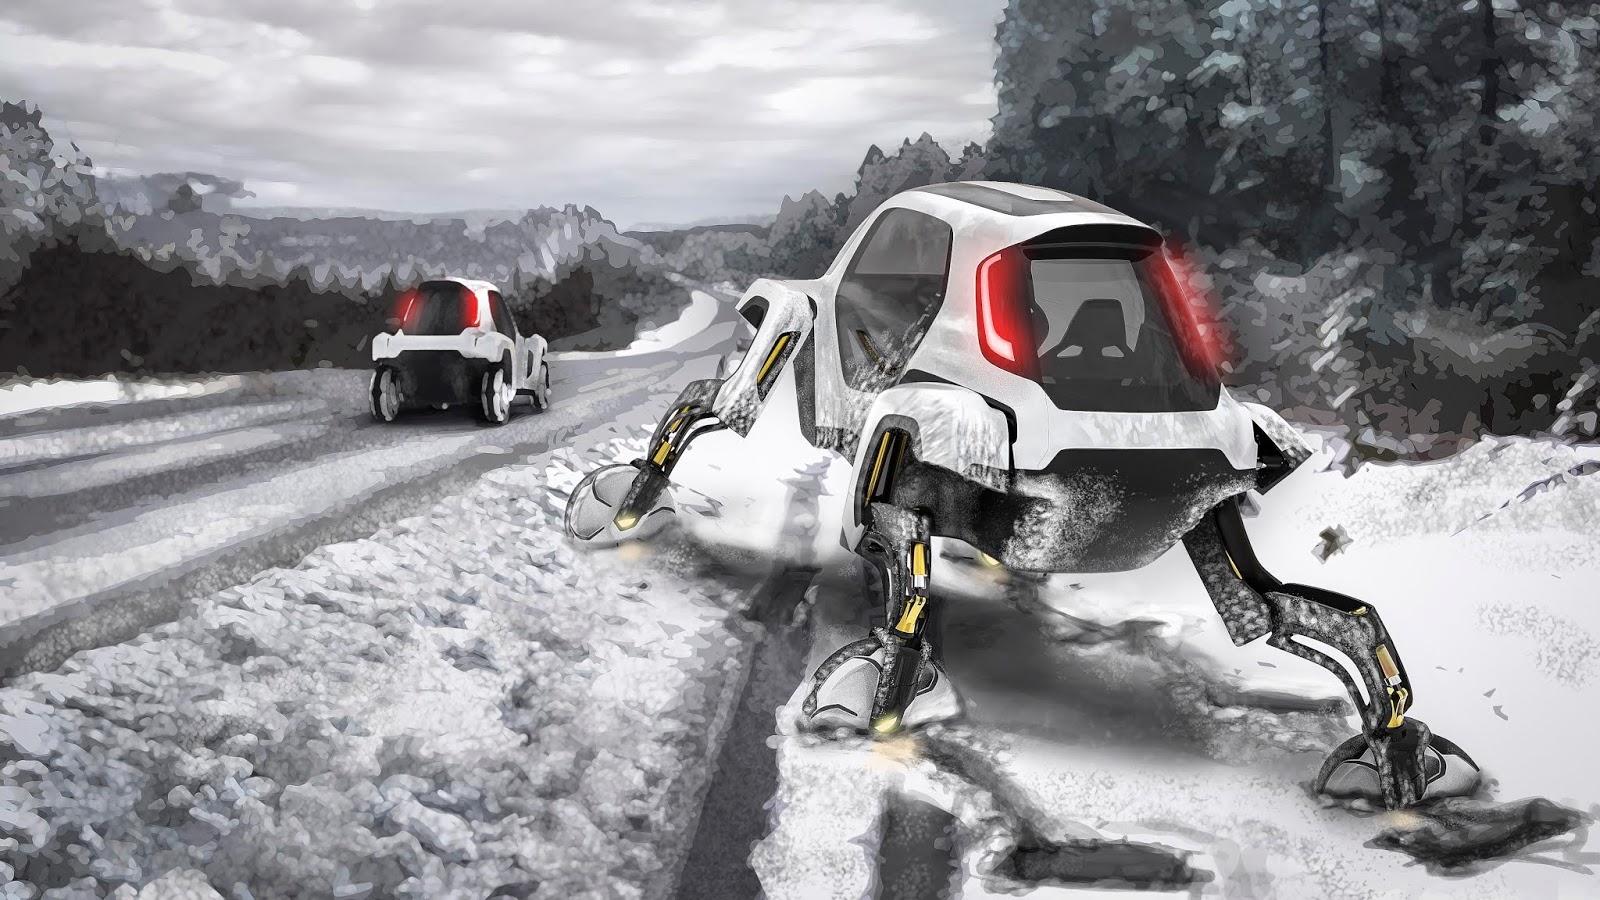 hyundai elevate concept252862529 H Hyundai έβγαλε όχημα με ρομποτικά πόδια! Electric cars, Hyundai, zblog, Τεχνολογία